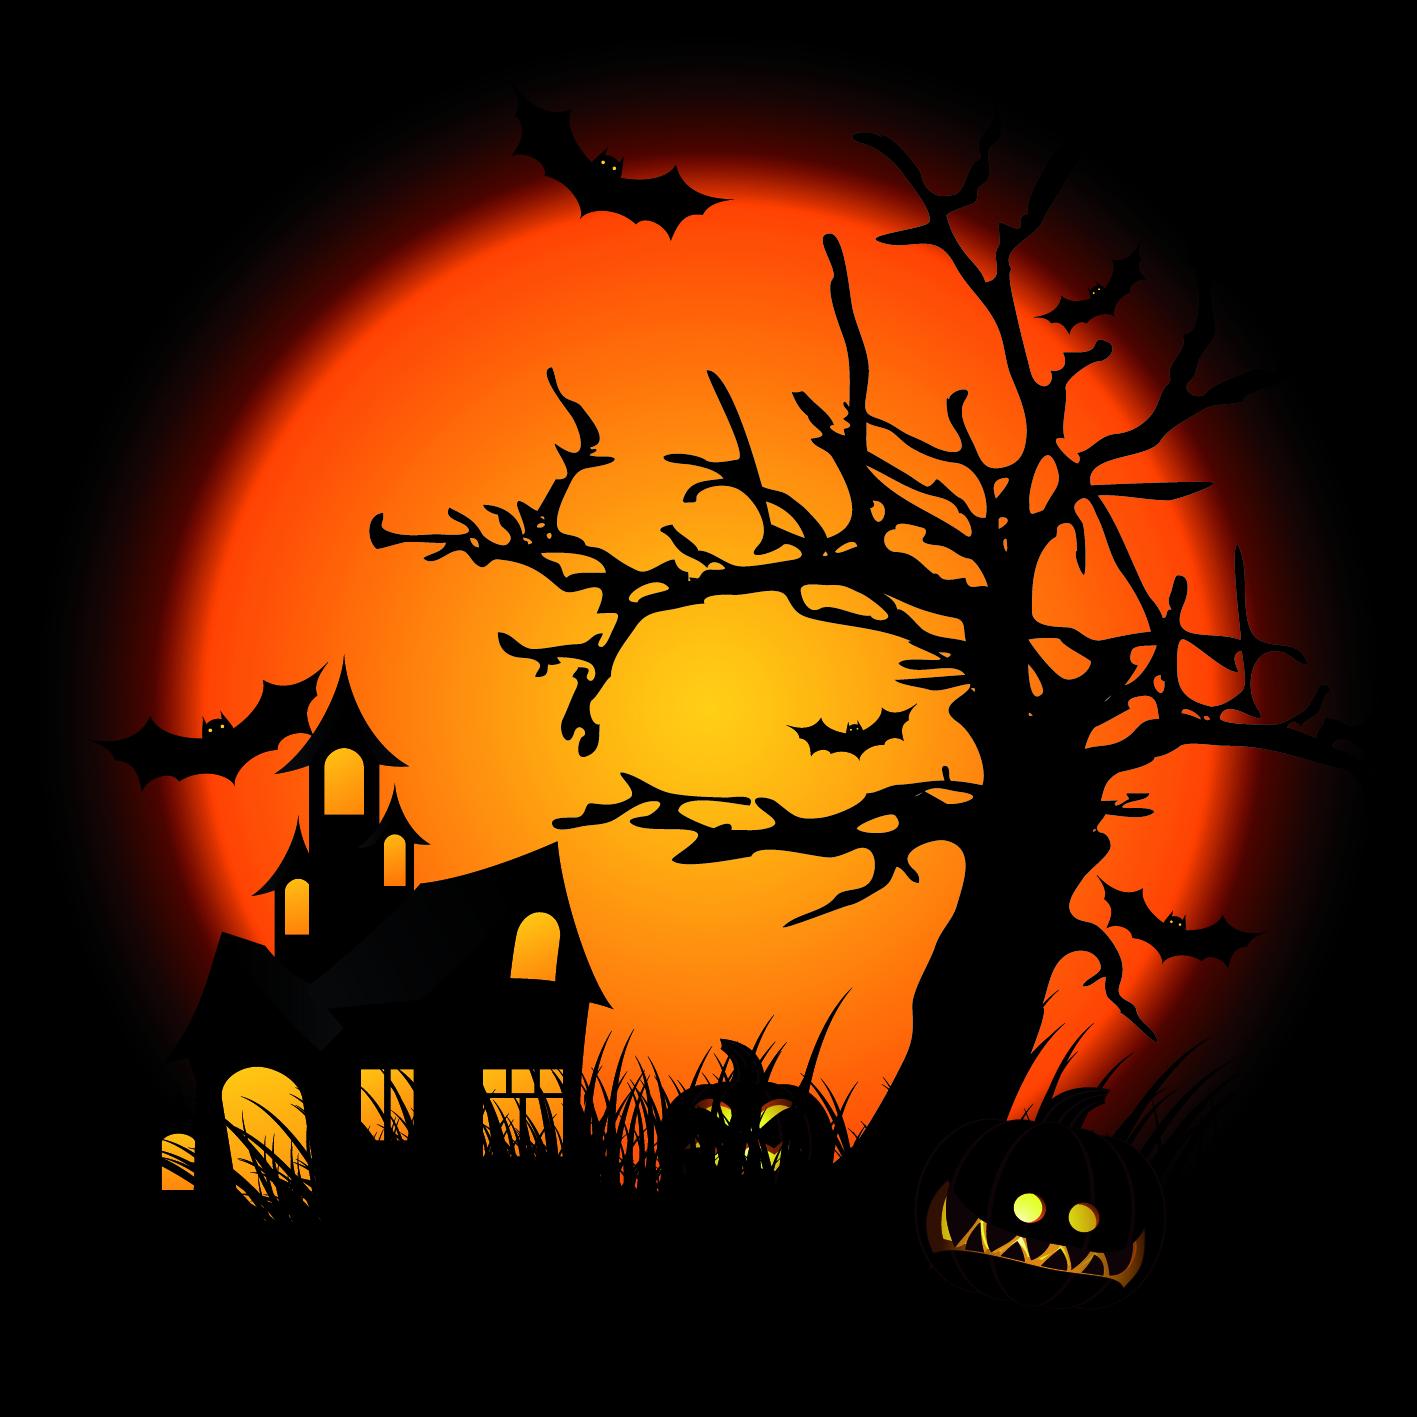 Free Halloween Happy Halloween Clipart F-Free halloween happy halloween clipart free large images clipartwiz-6